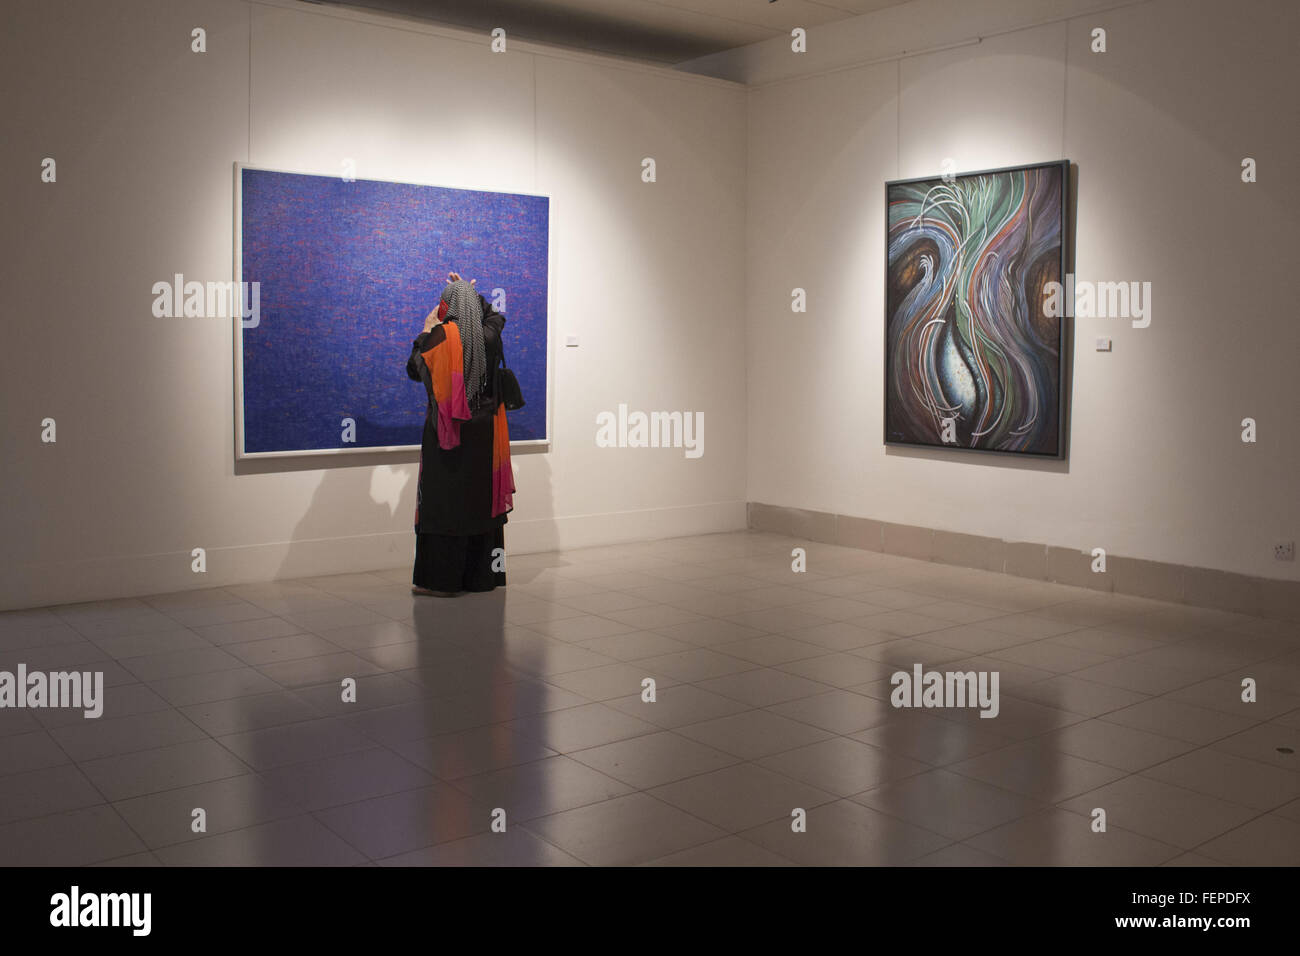 Dhaka, Bangladesh. 8th Feb, 2016. Art lovers flock to the third edition of Dhaka Art Summit, Dhaka, Bangladesh. - Stock Image